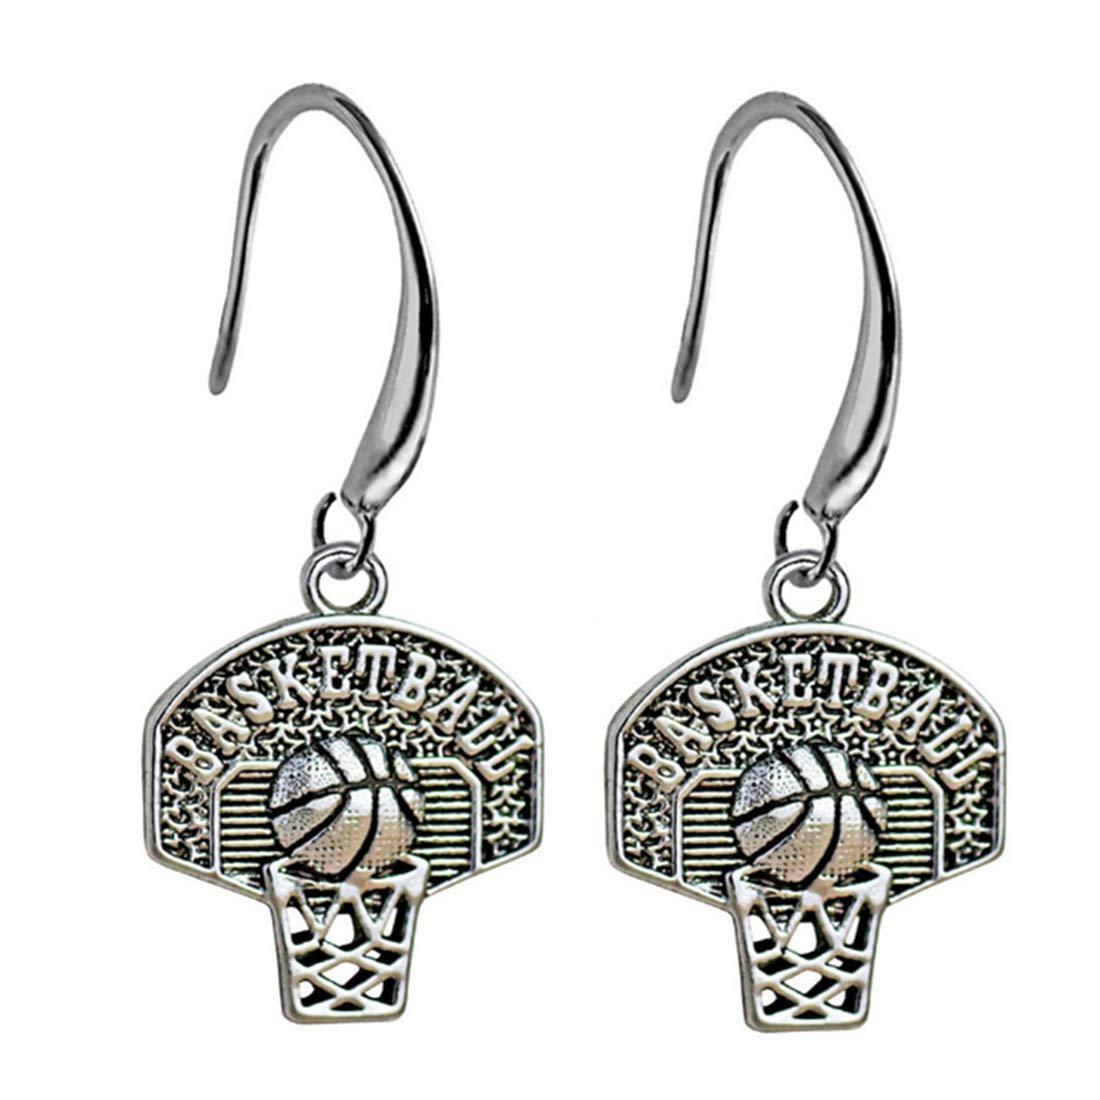 Basketball Earrings Basketball Jewelry Basketball Gift Basketball Charm Basketball Pendant Sports Earrings Sports Jewelry Sports Gift